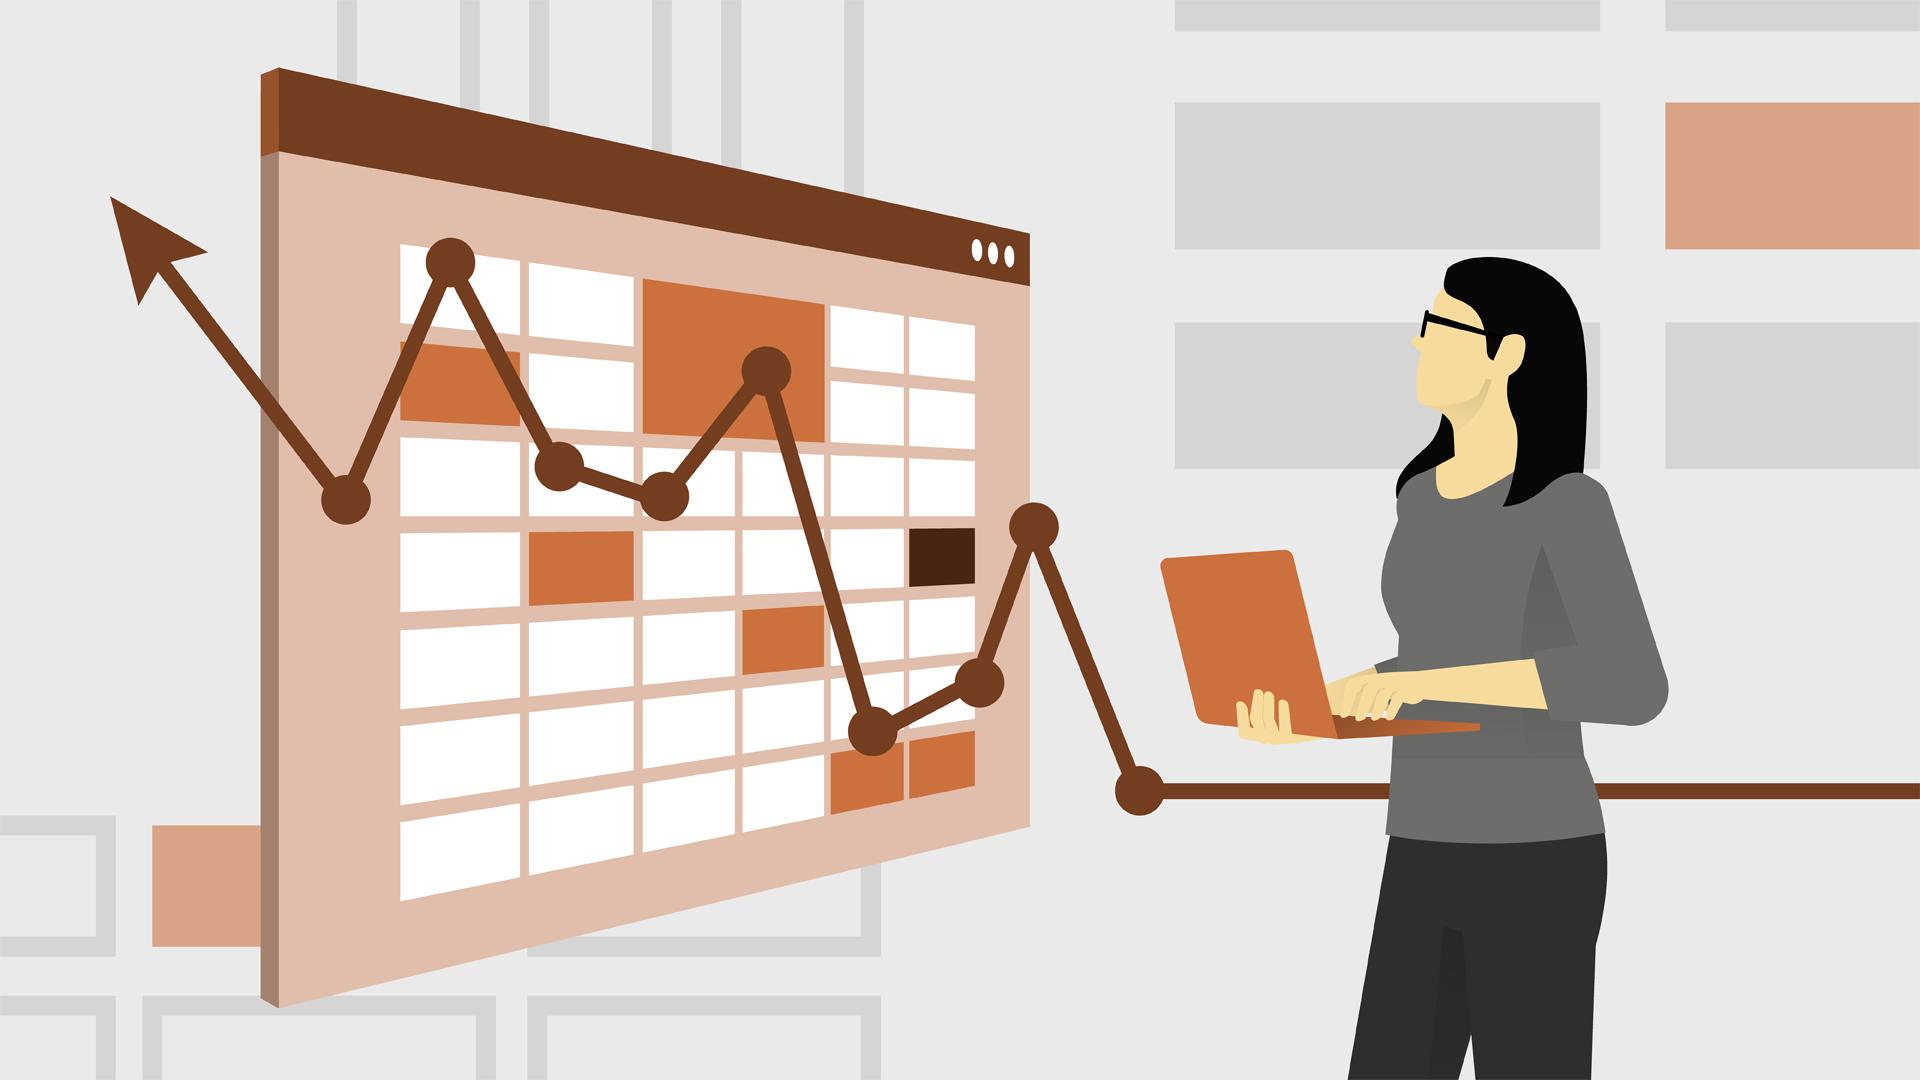 Lynda excel 2007 business statistics torrent